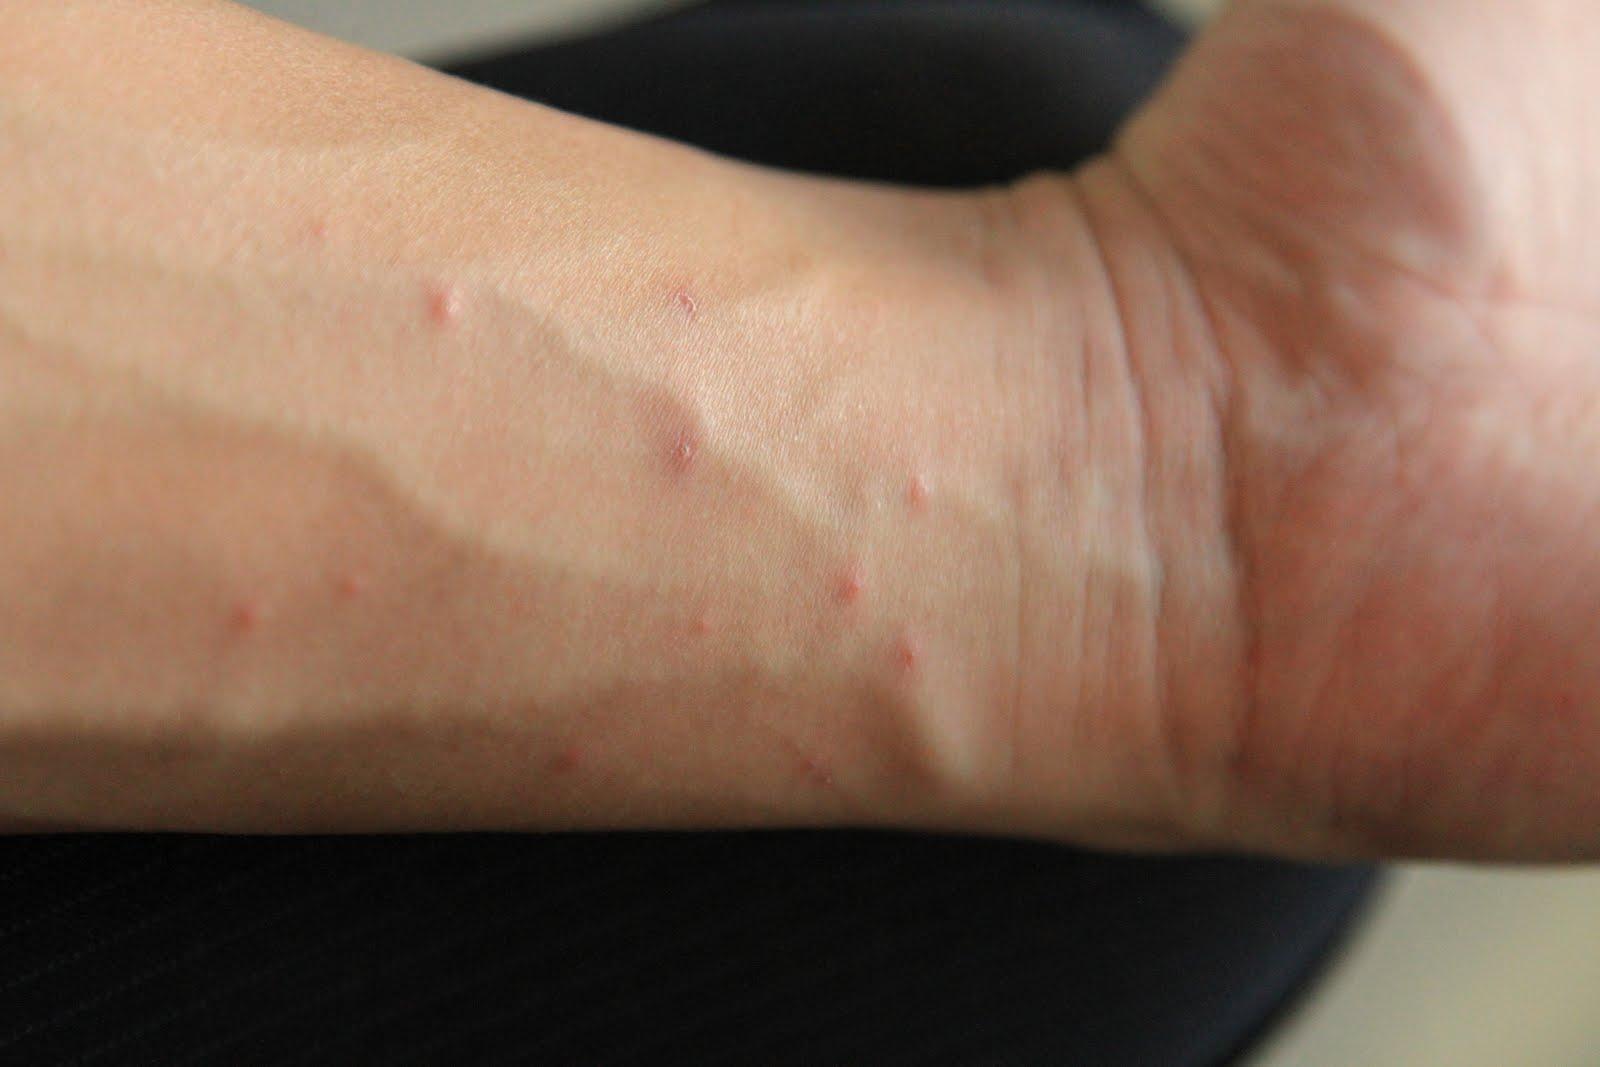 Scabies Bug Bites Photos Welding Arc Photos Xxy Film